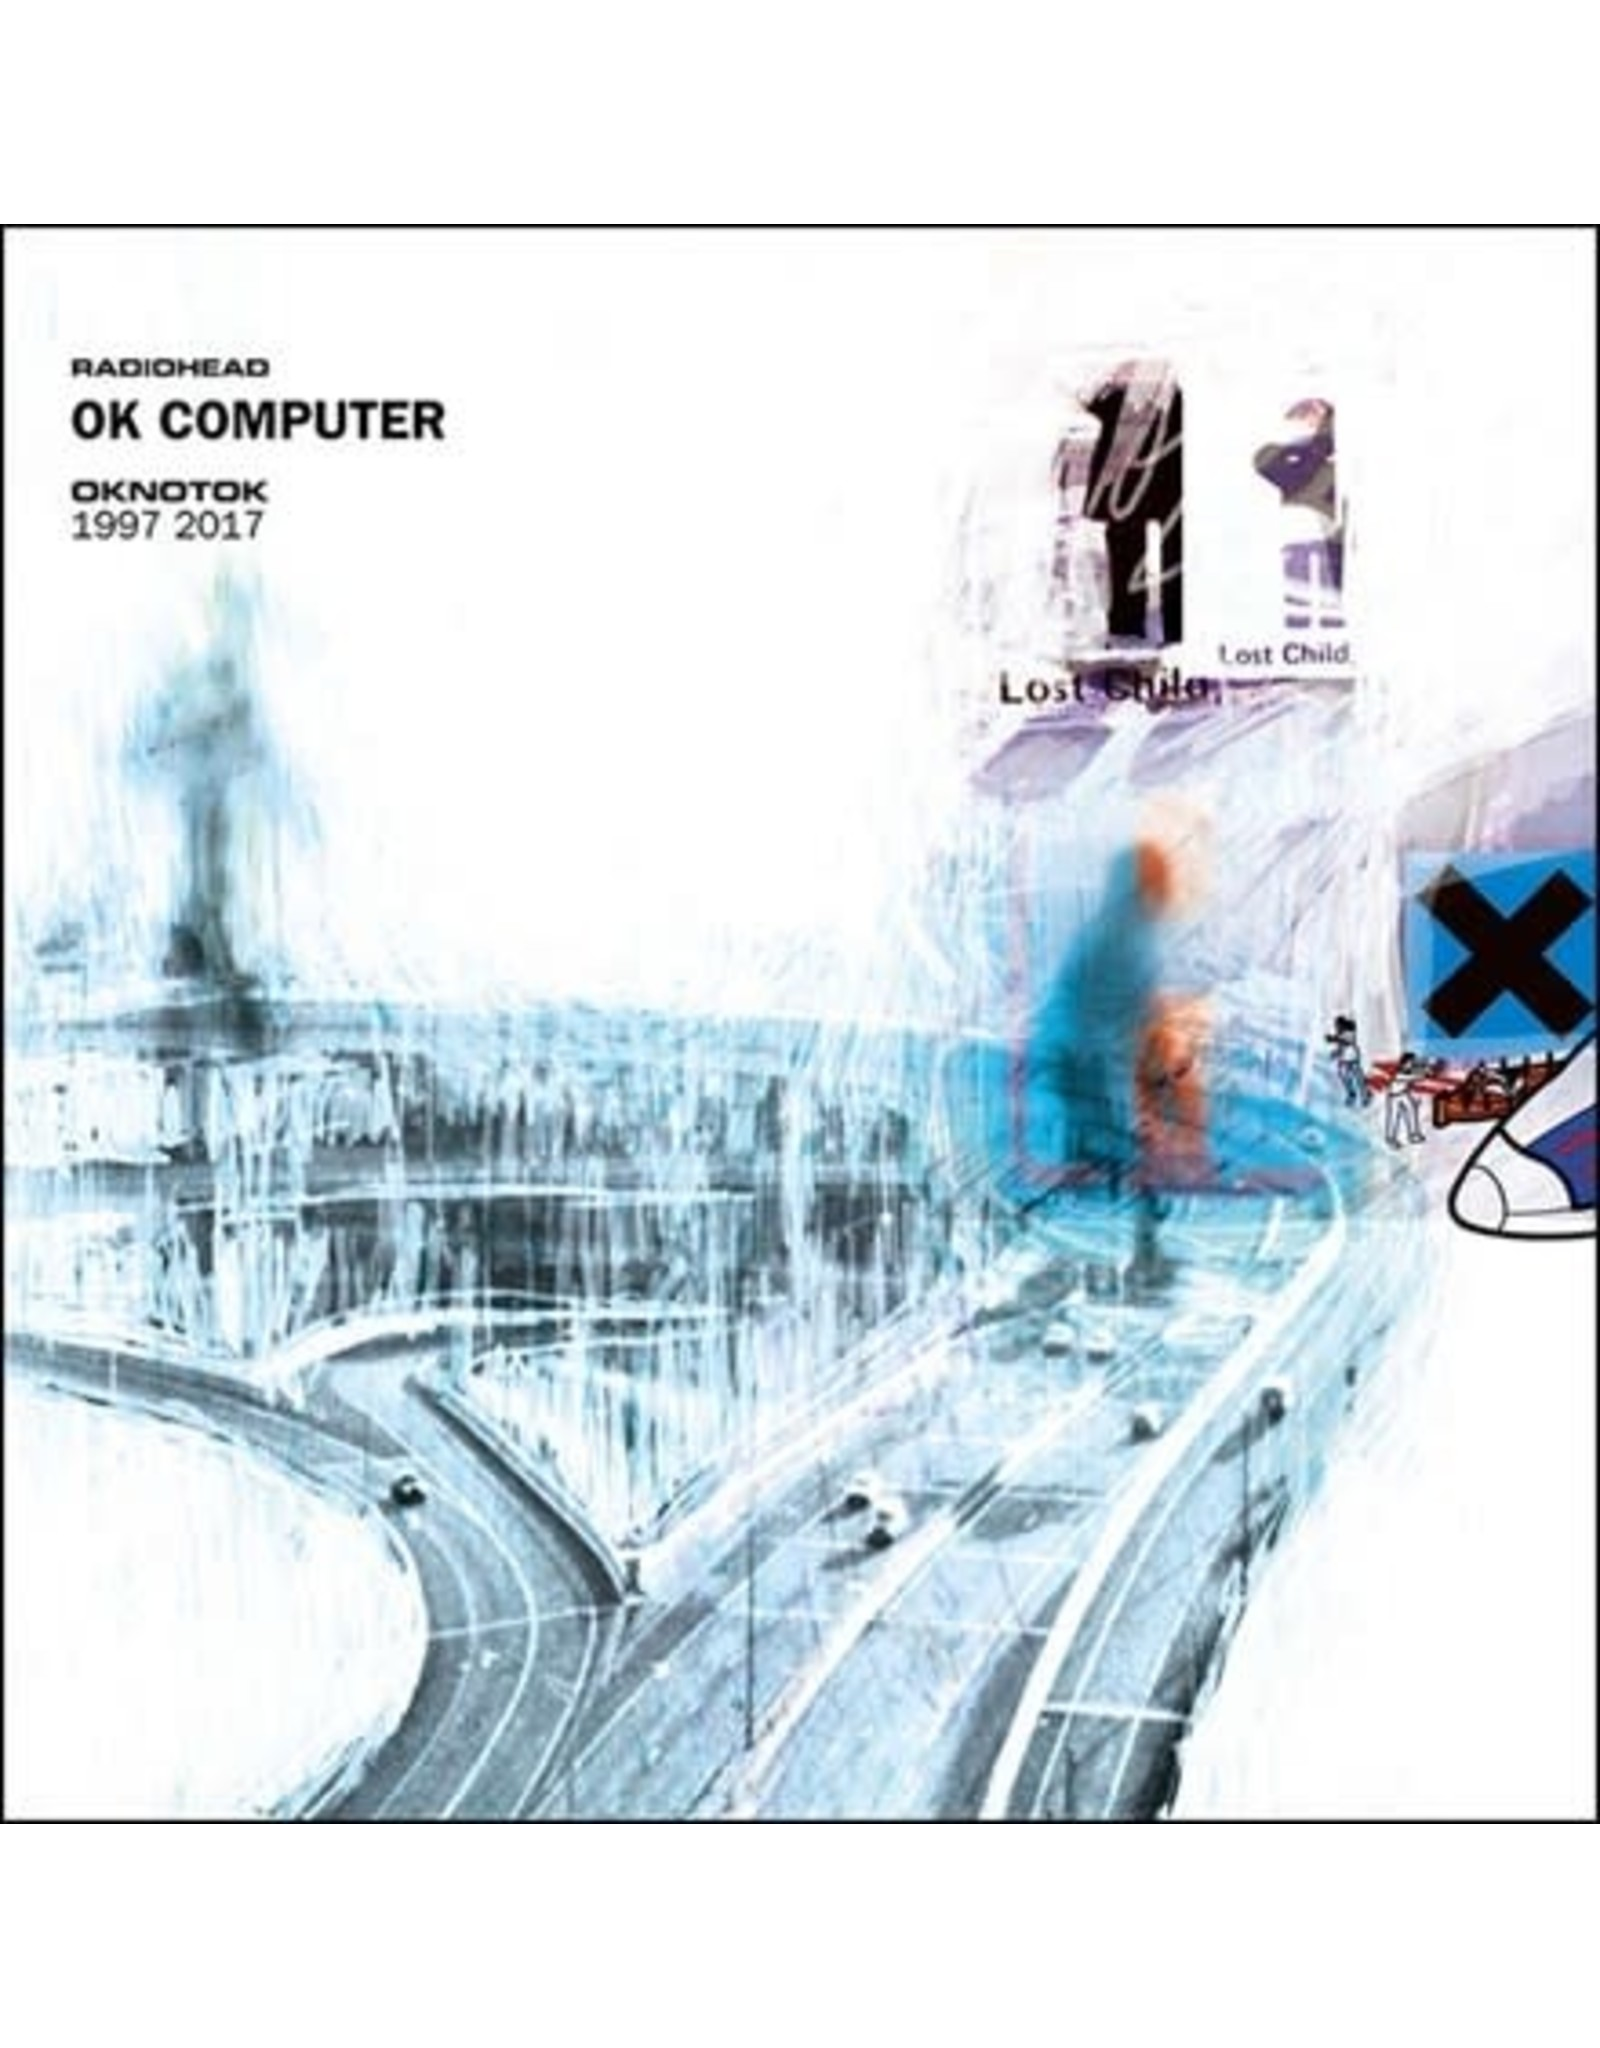 XL Radiohead: OK Computer - Oknotok 1997 2017 LP